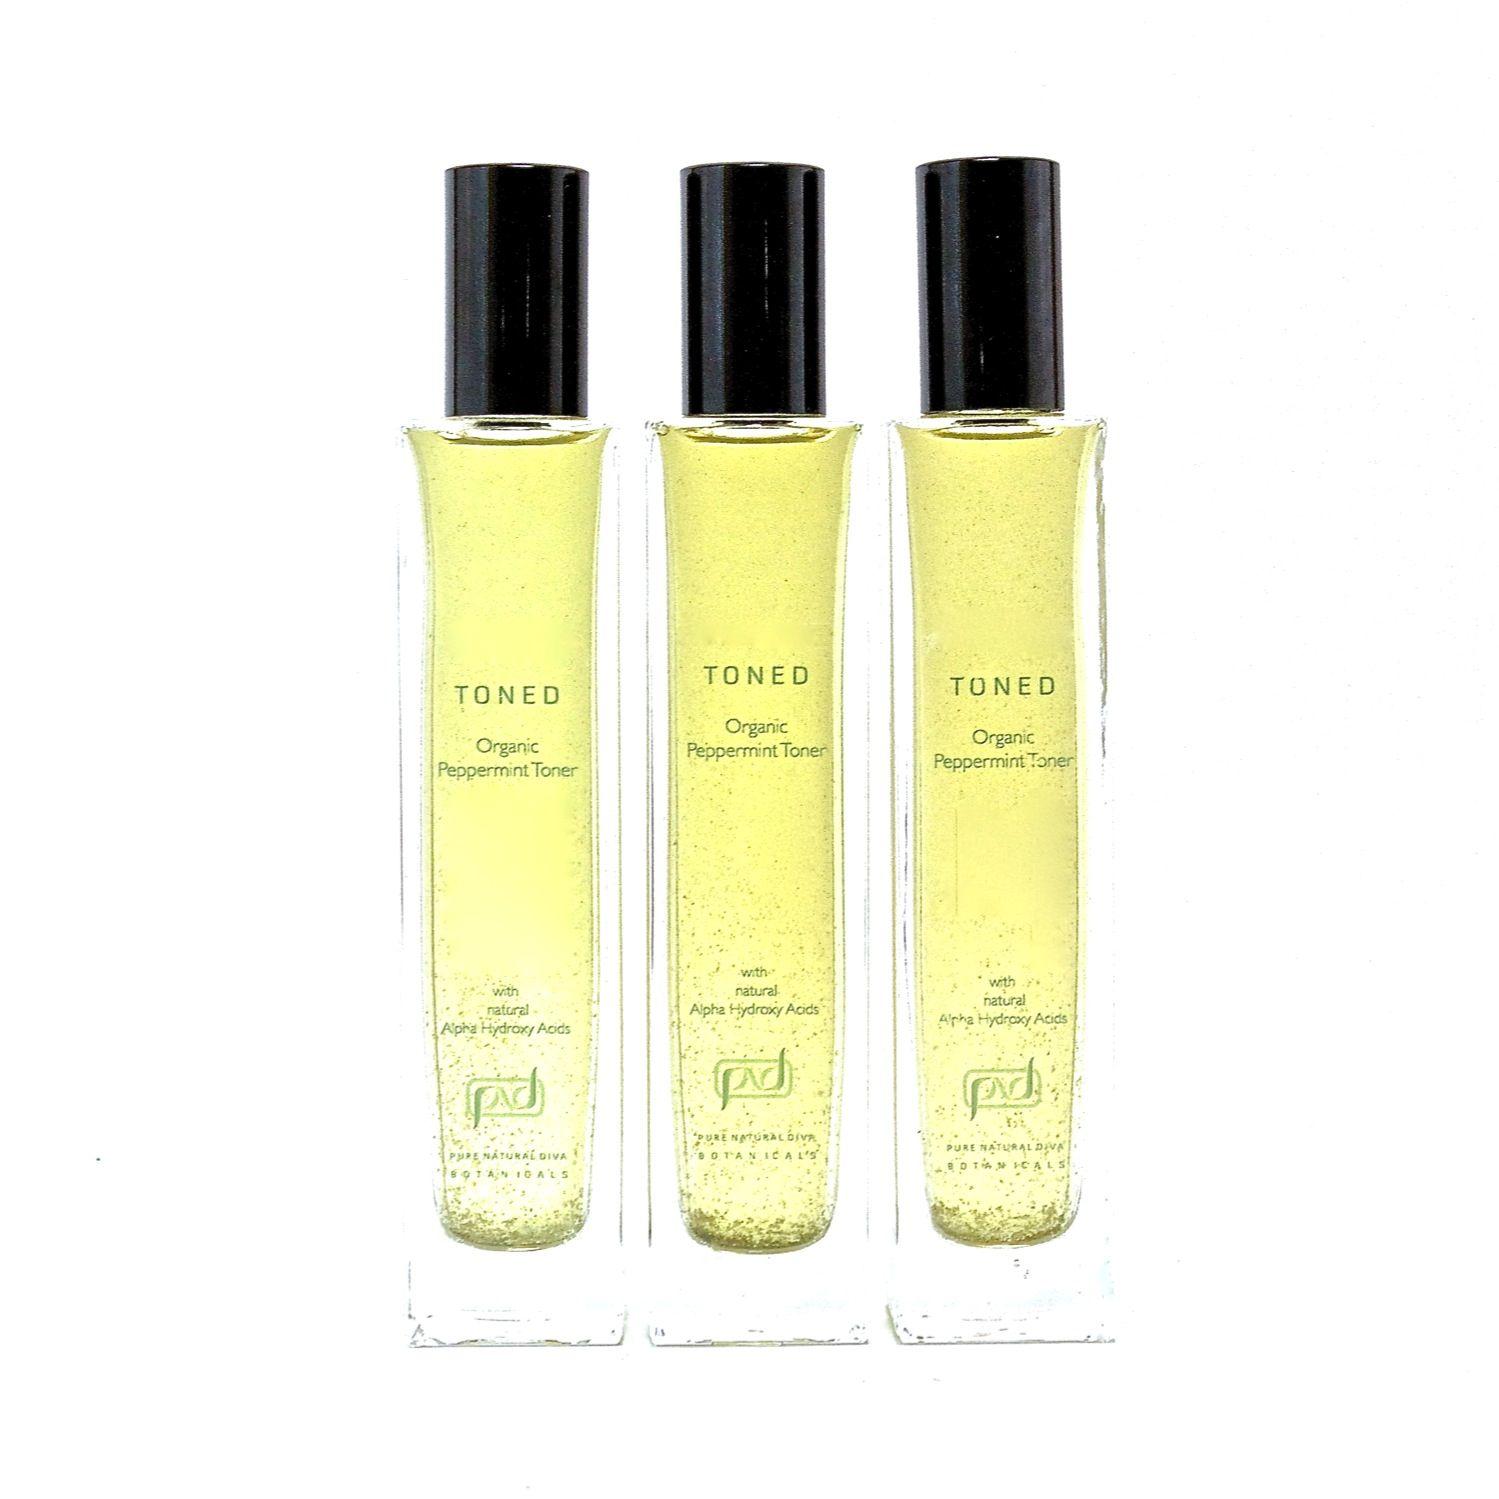 Toned Organic Peppermint Toner Pure Natural Diva Organic Beauty Natural Perfumes Diy Beauty Secrets Organic Peppermint Beauty Tips Home Remedy